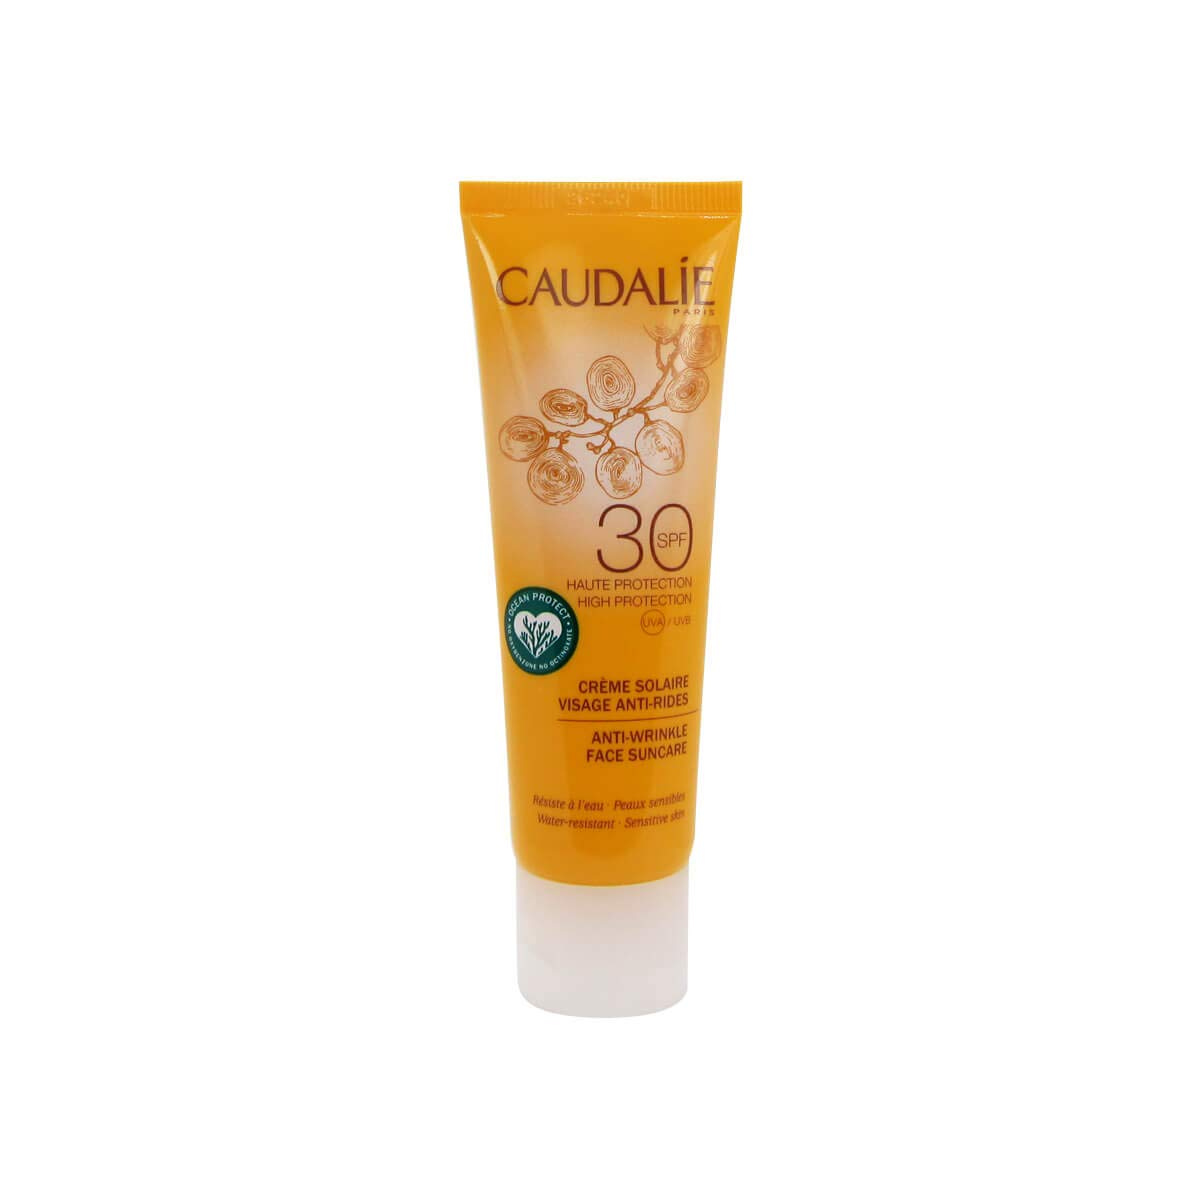 Caudalie - Cuidado Solar Antiarrugas SPF 30, 50 ml: Amazon.es